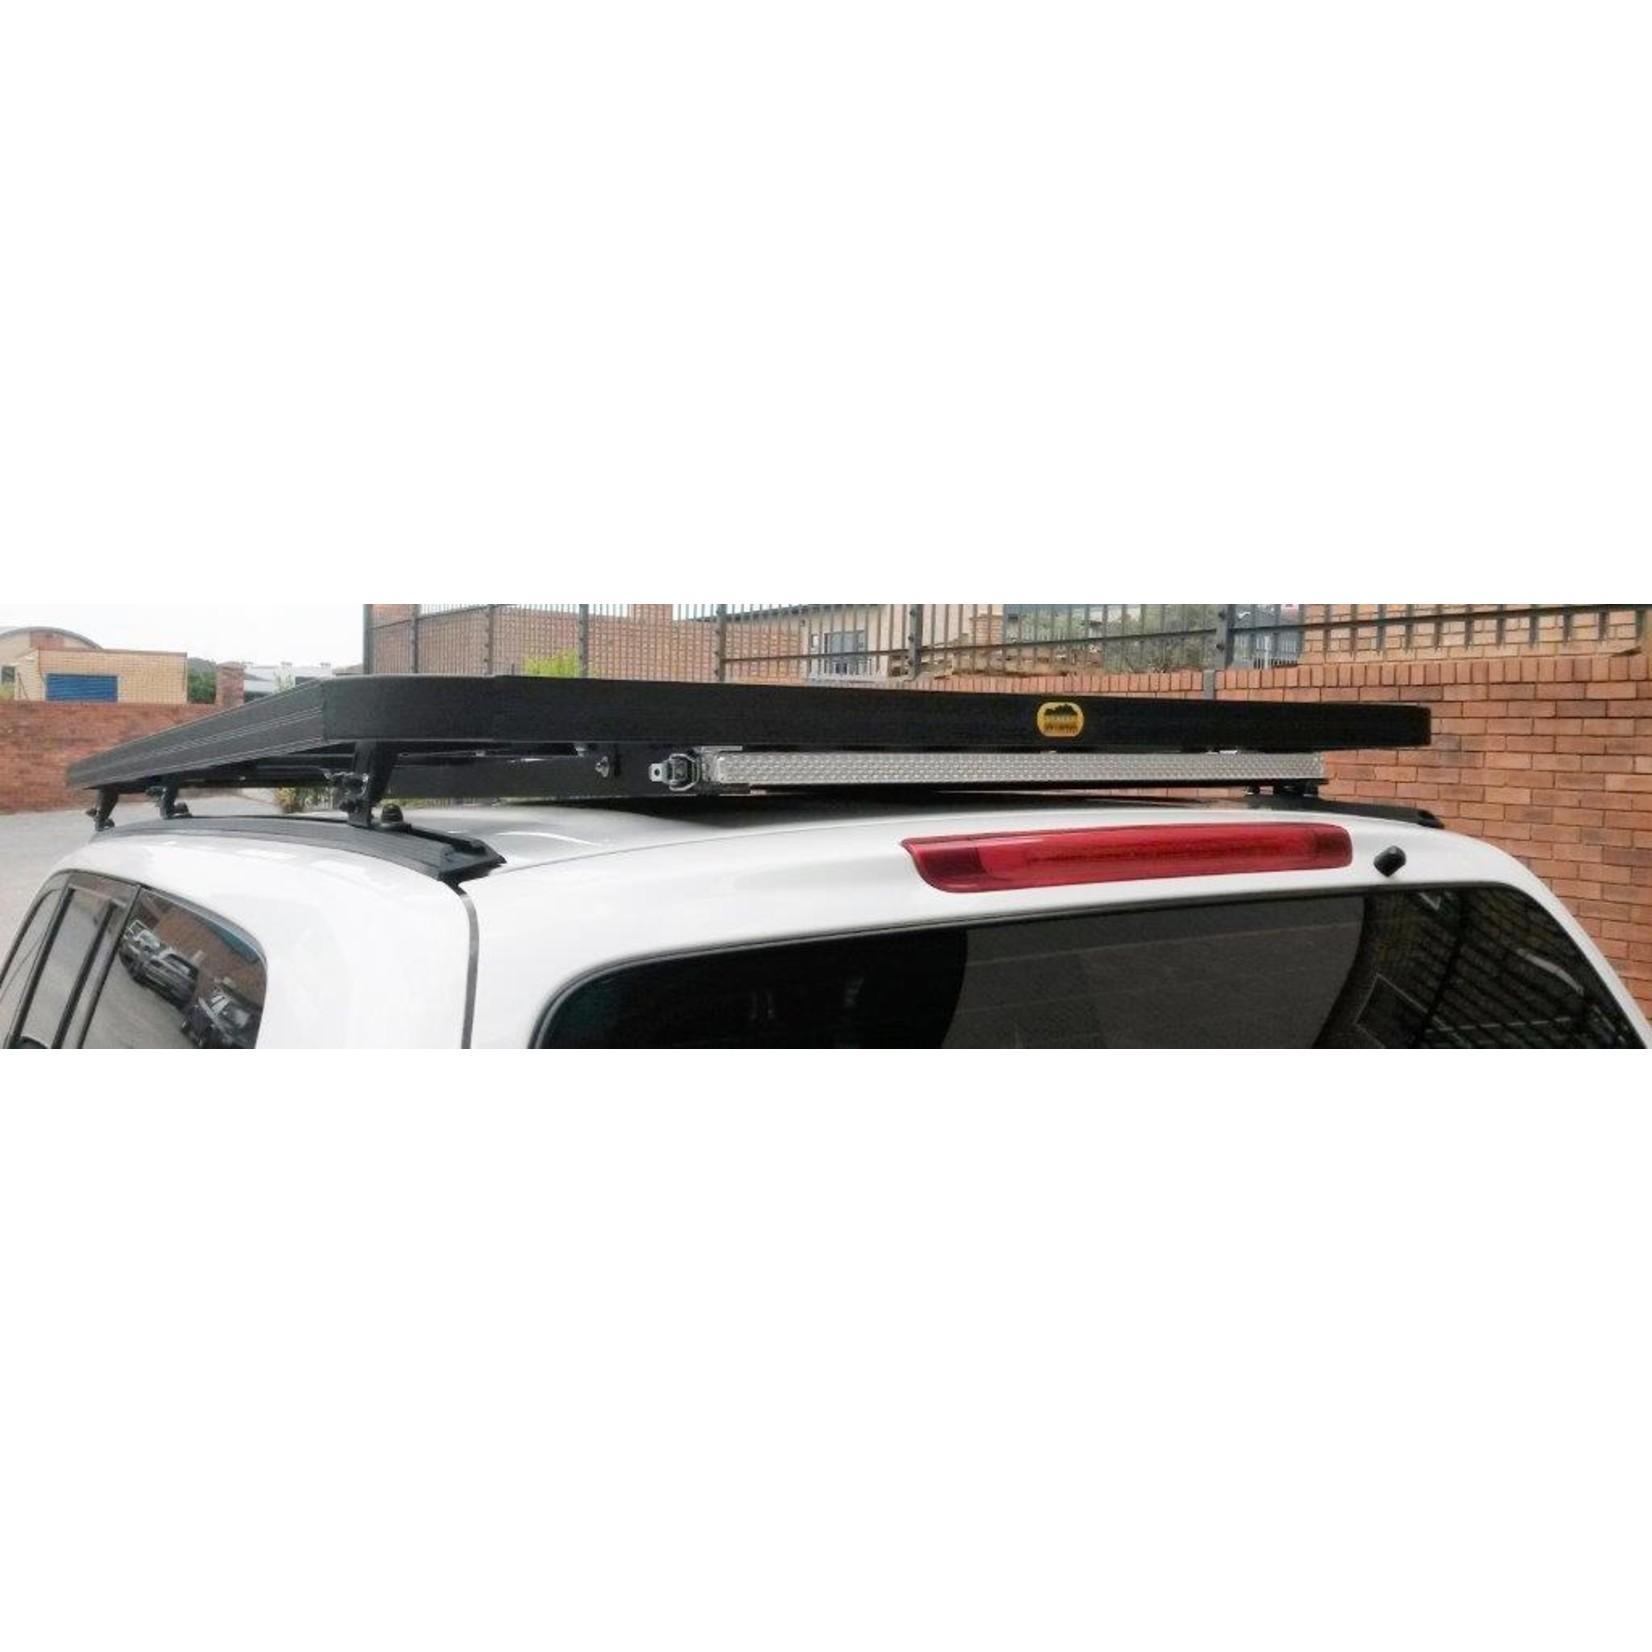 Big Country 4x4 Big Country 4x4 Toyota Land Cruiser 100 Roof Rack